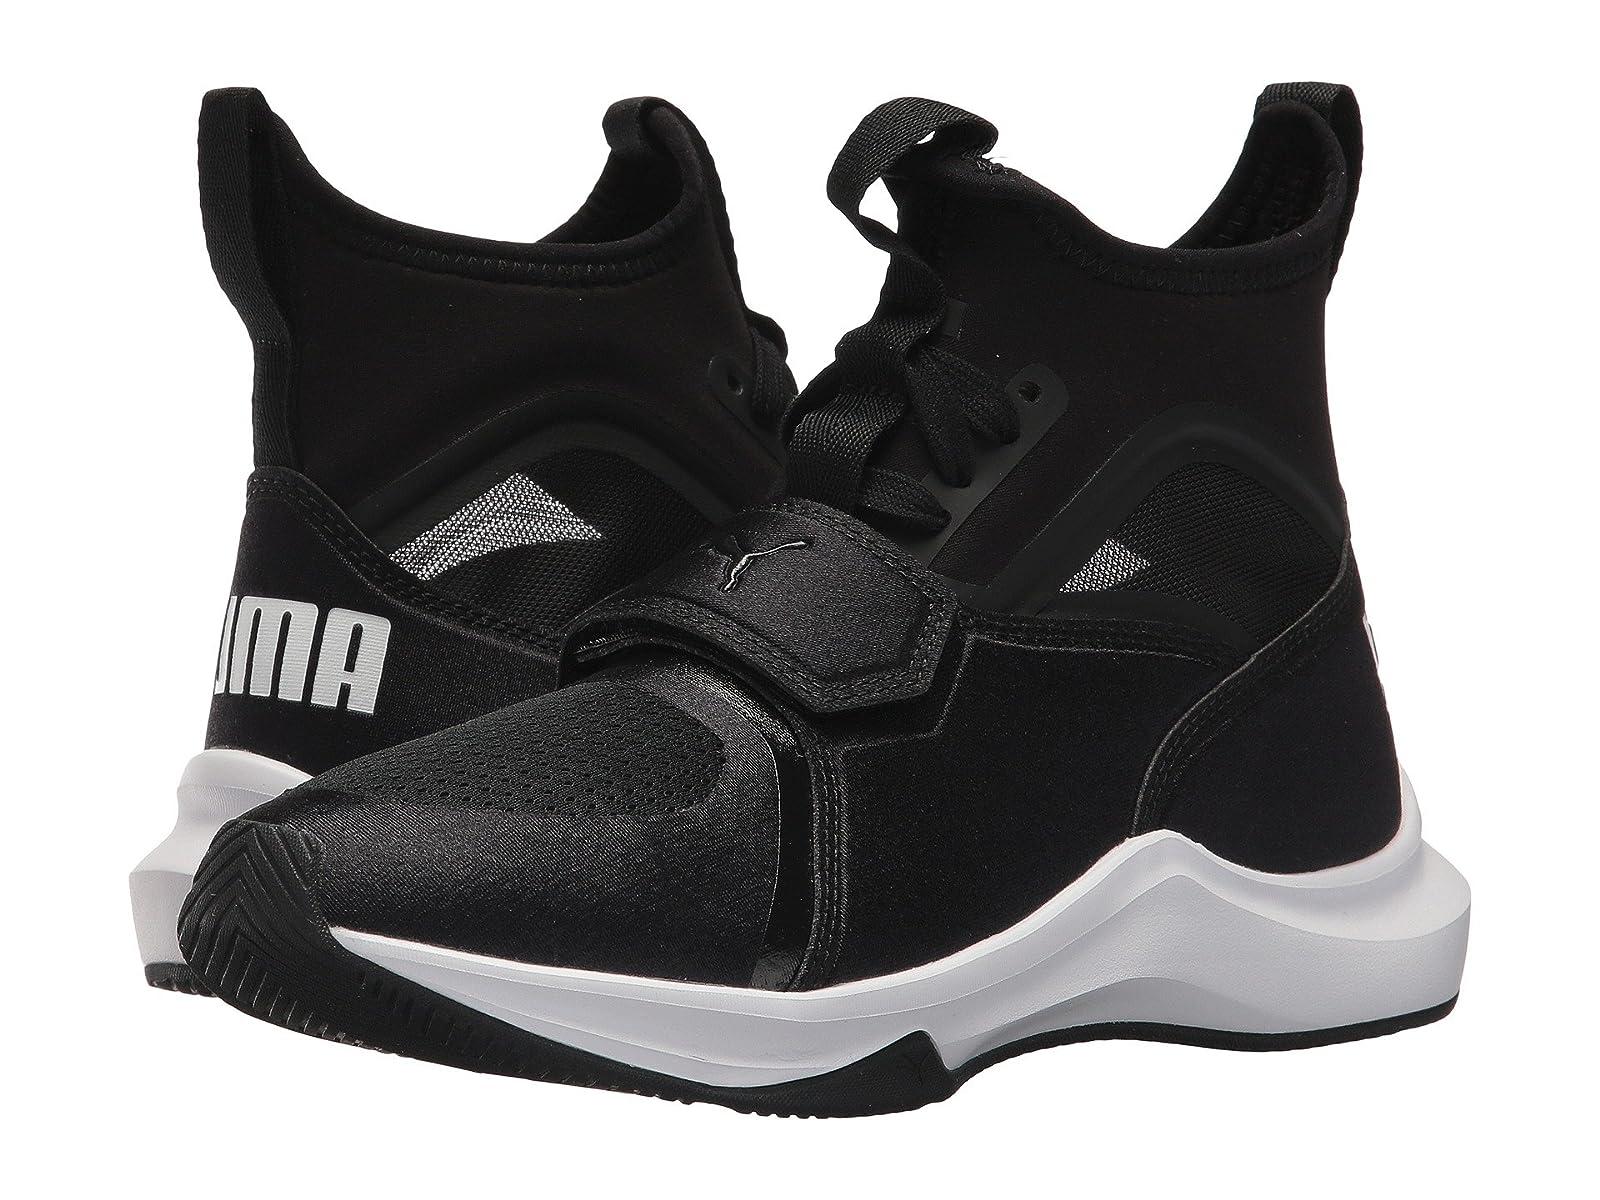 Puma Kids Phenom (Big Kid)Cheap and distinctive eye-catching shoes